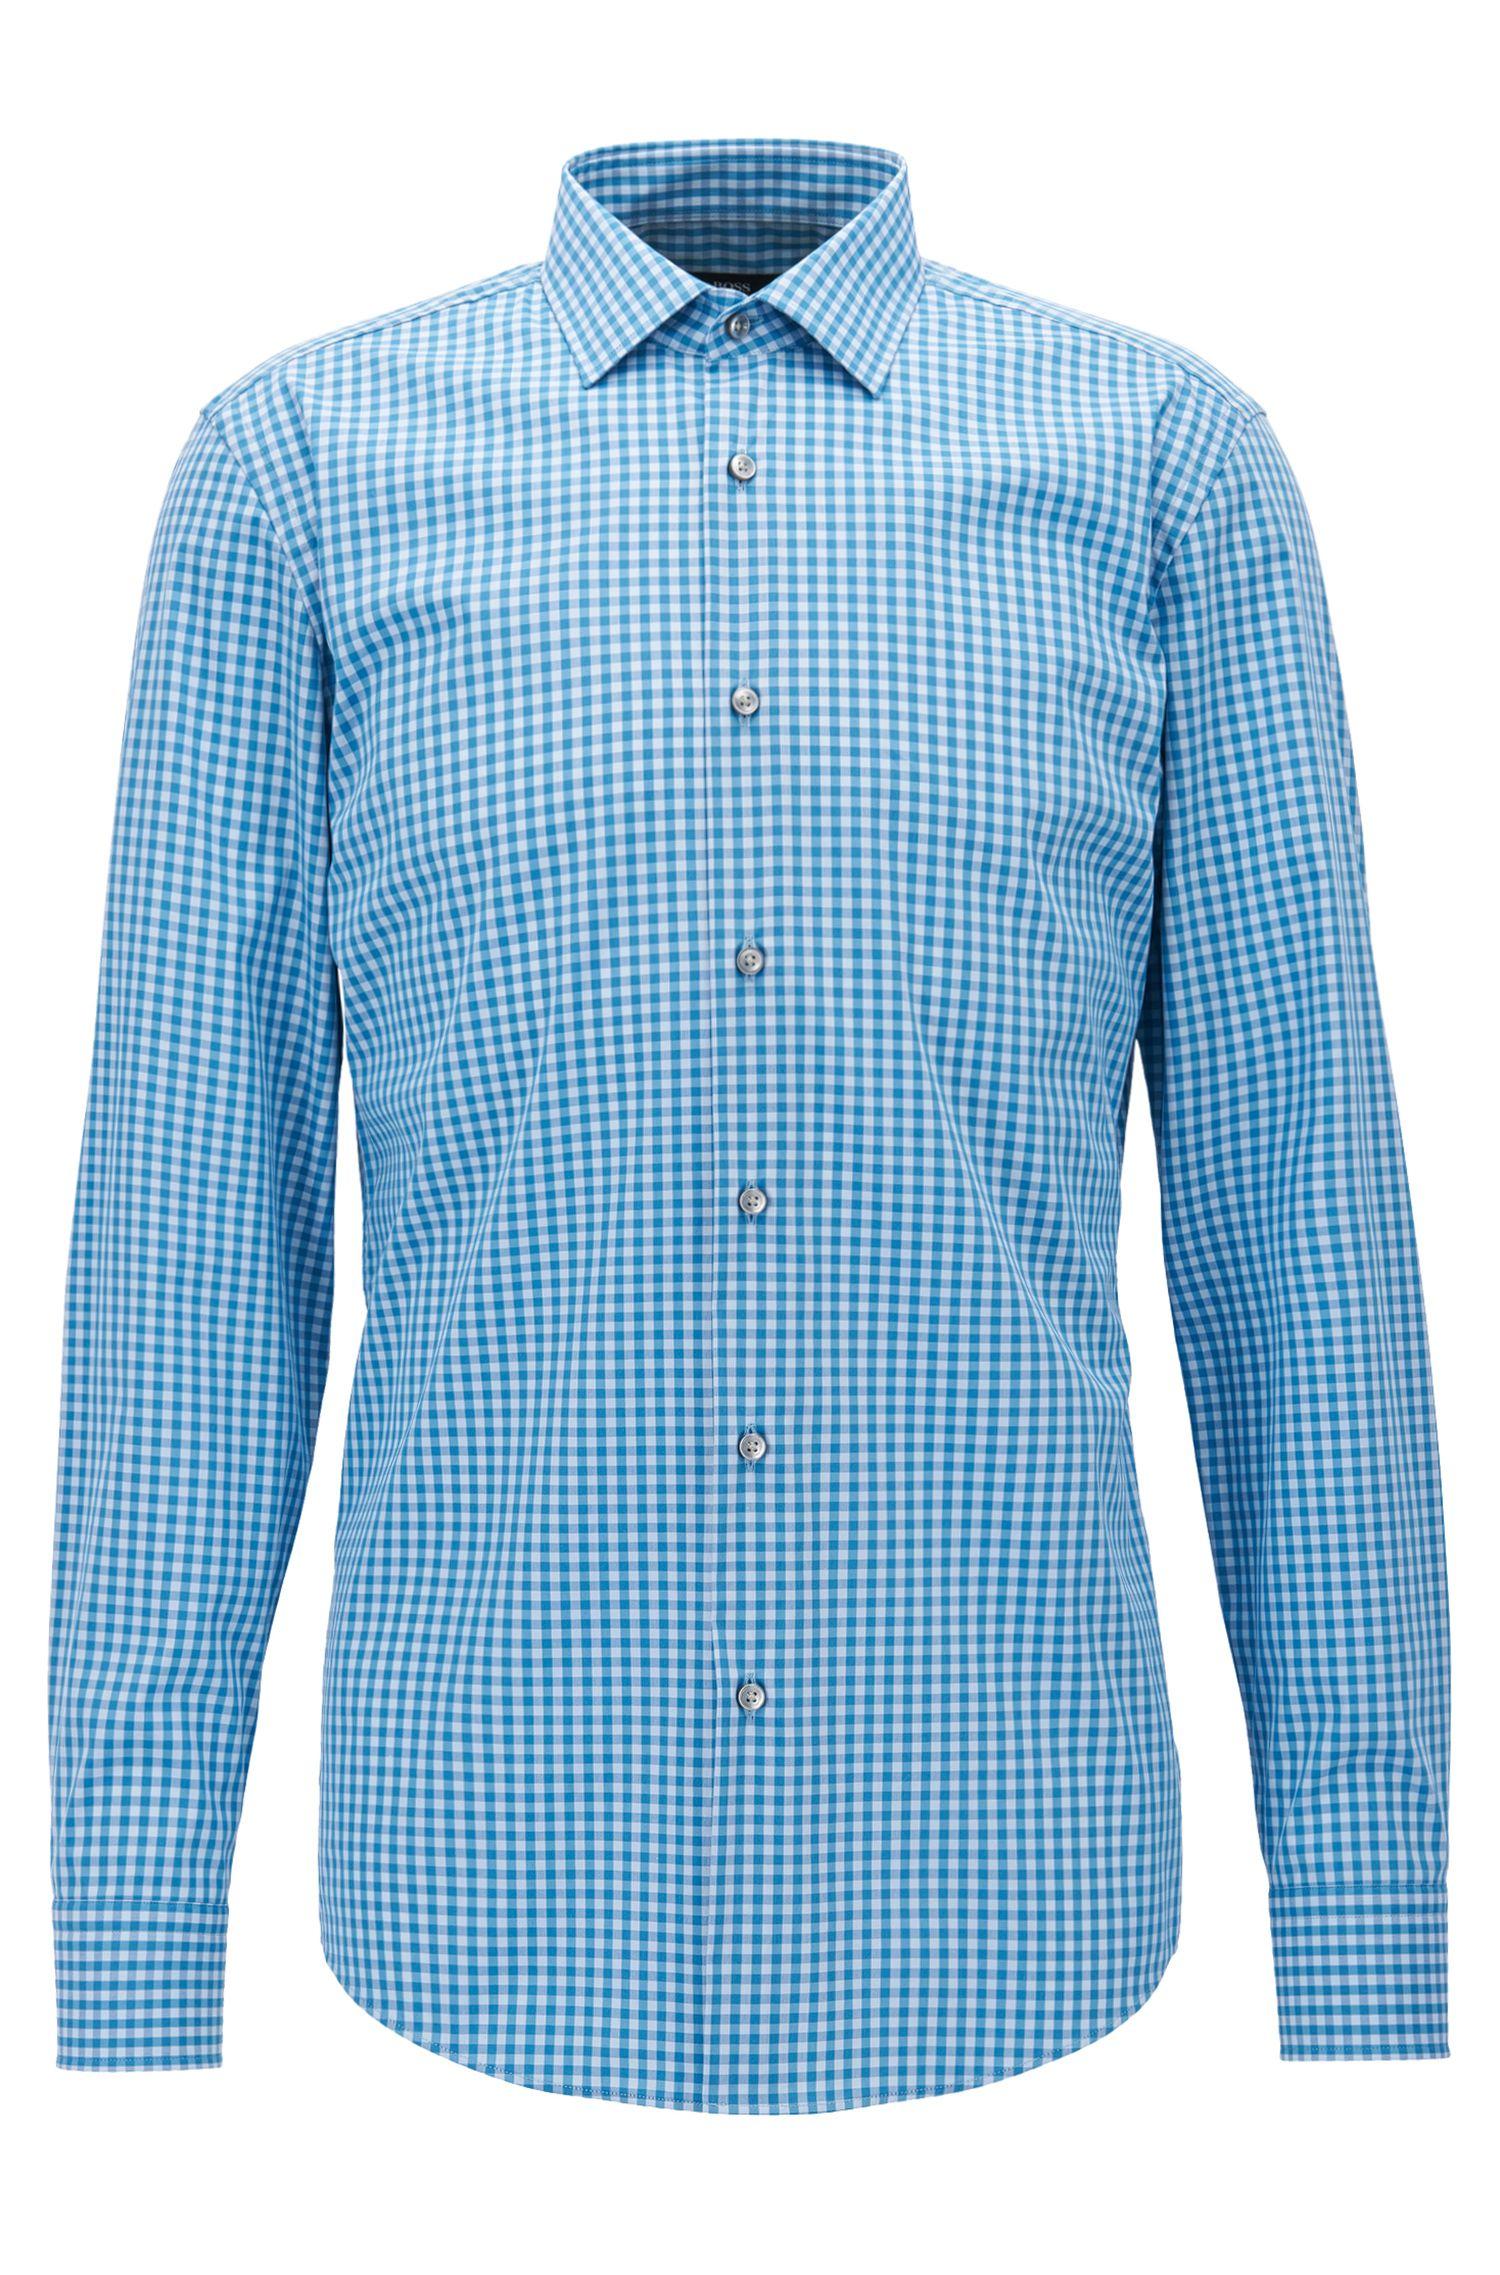 Gingham Cotton Blend Dress Shirt, Slim Fit | Jenno